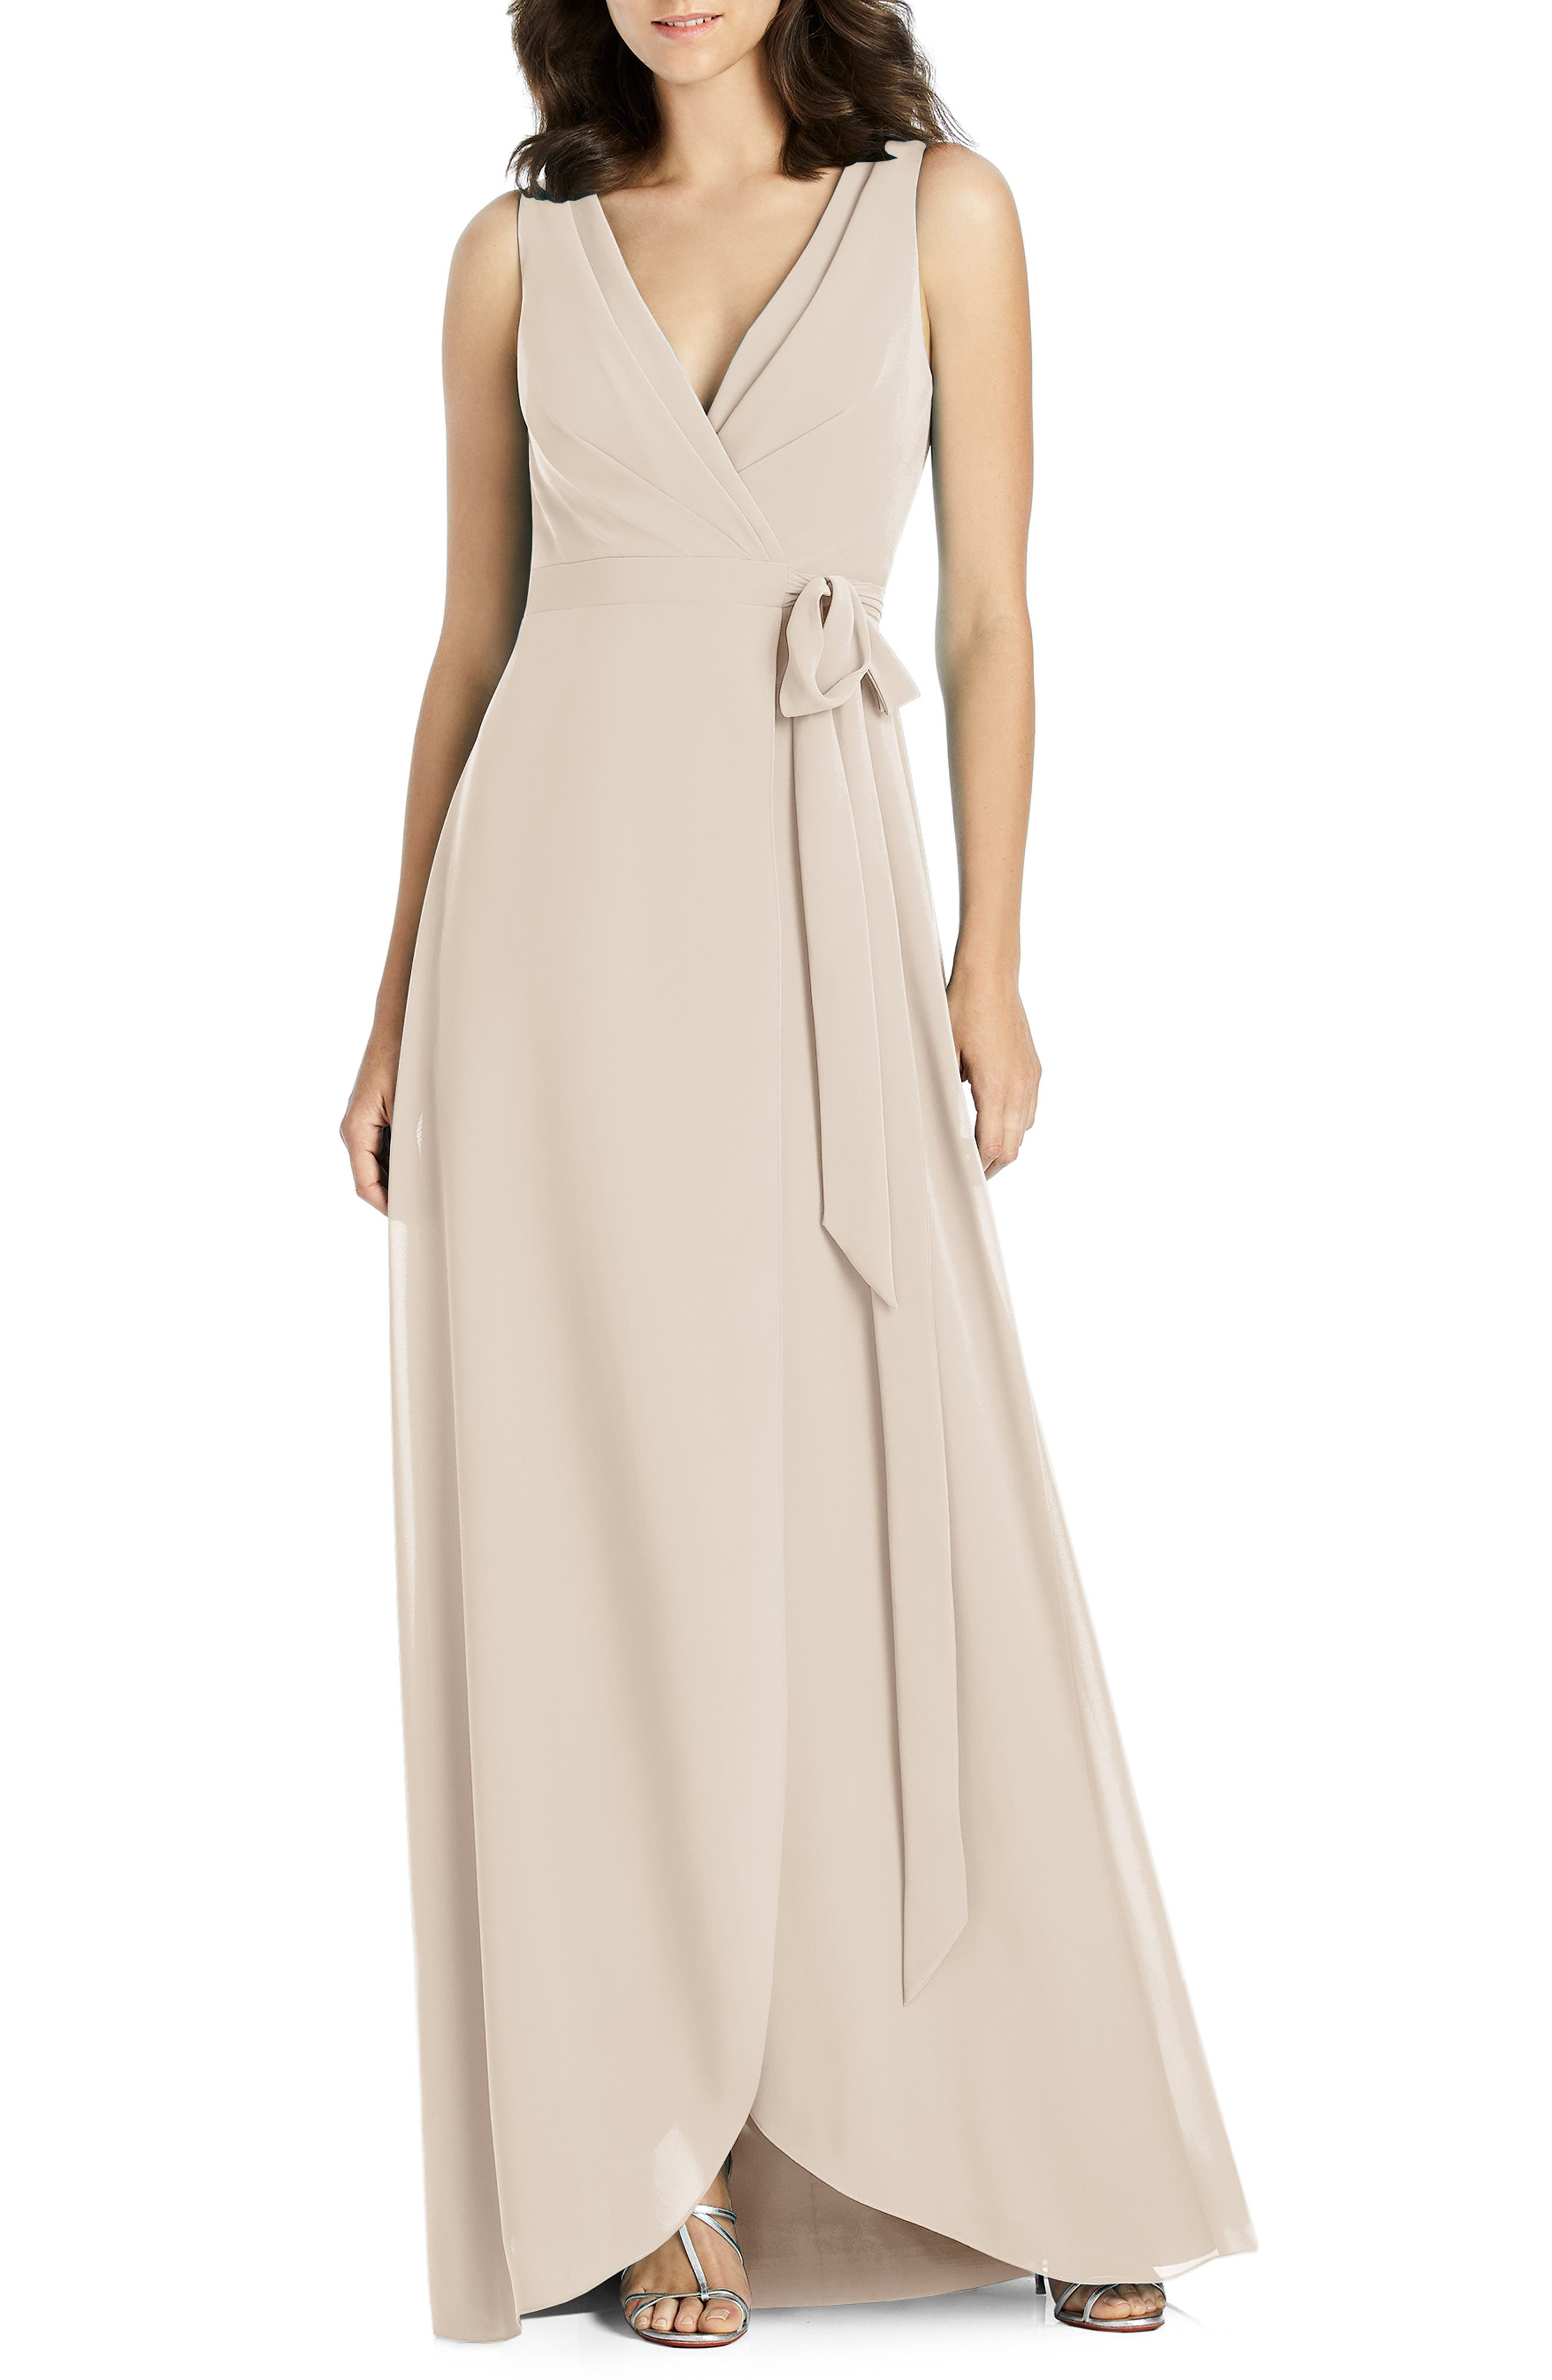 Jenny Packham Chiffon Wrap Evening Dress, Beige